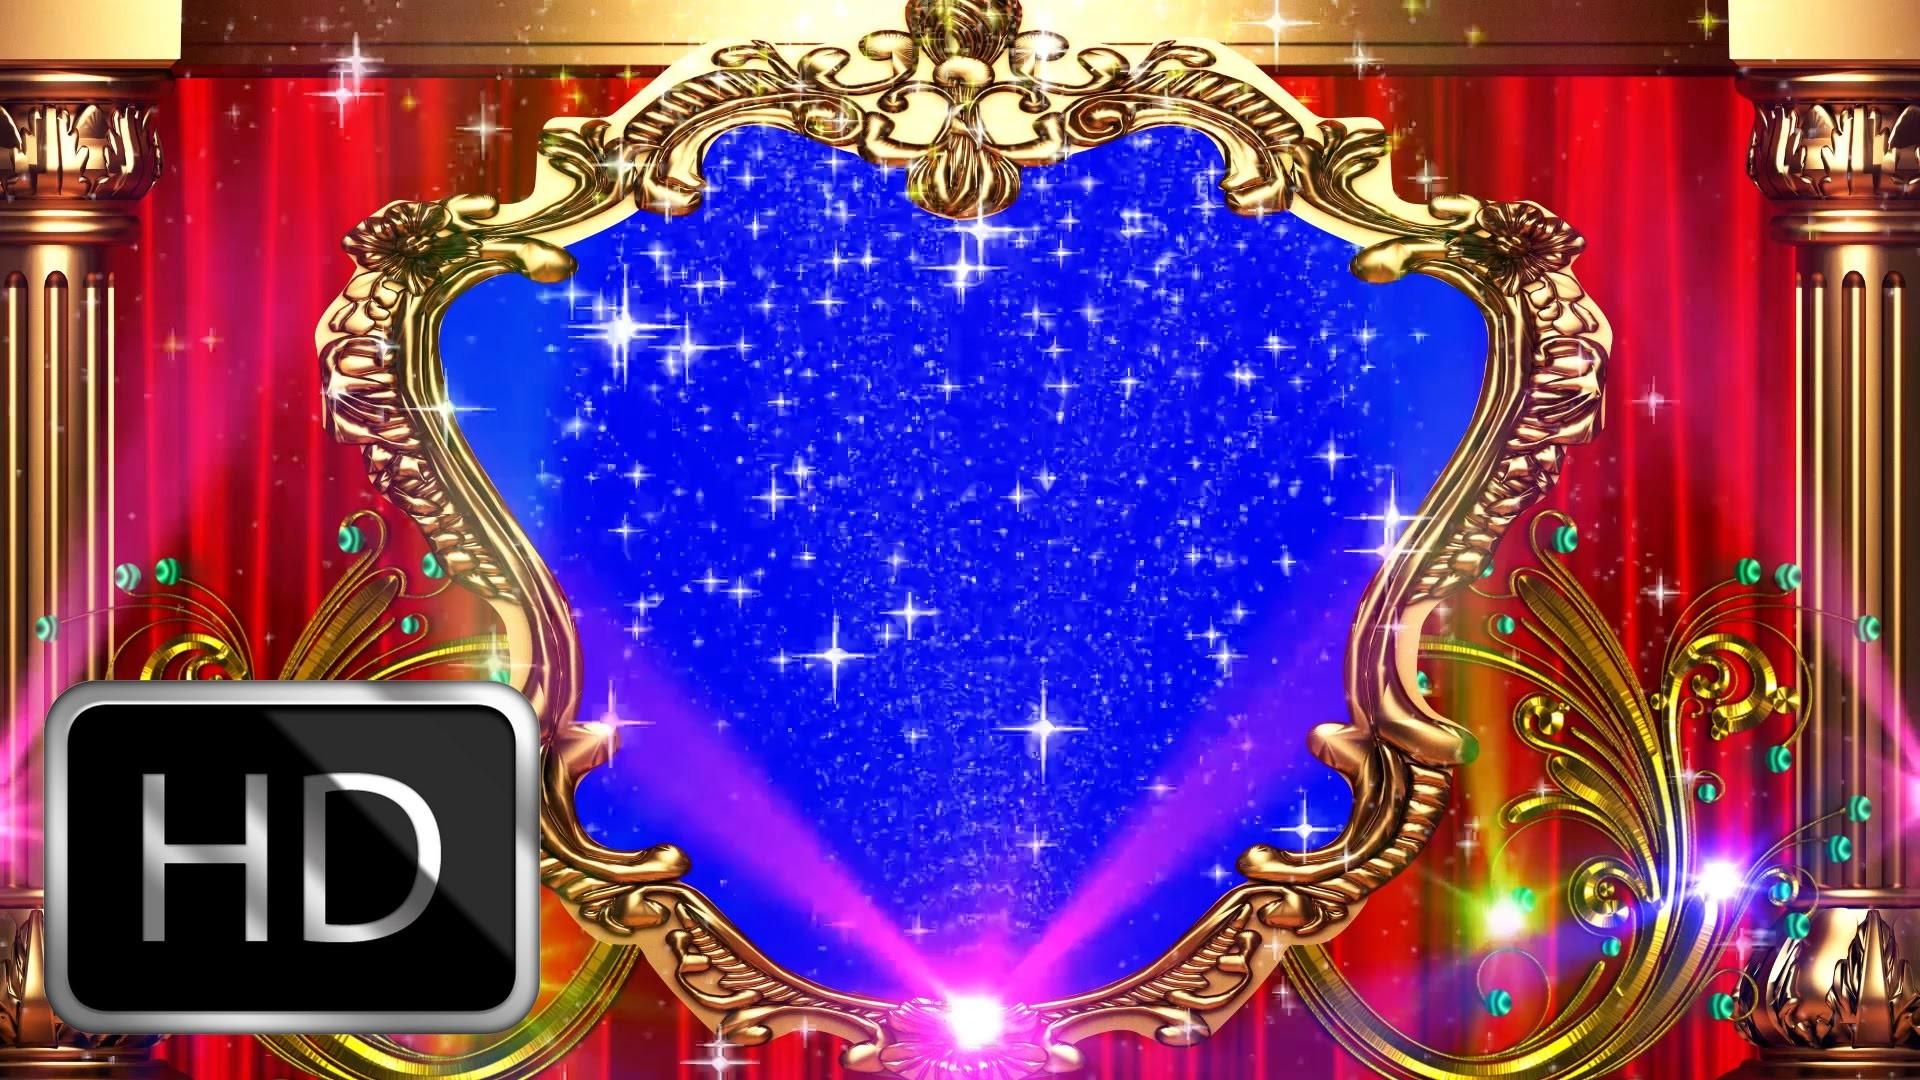 44 Wedding Backgrounds 183 ① Download Free Beautiful Full Hd